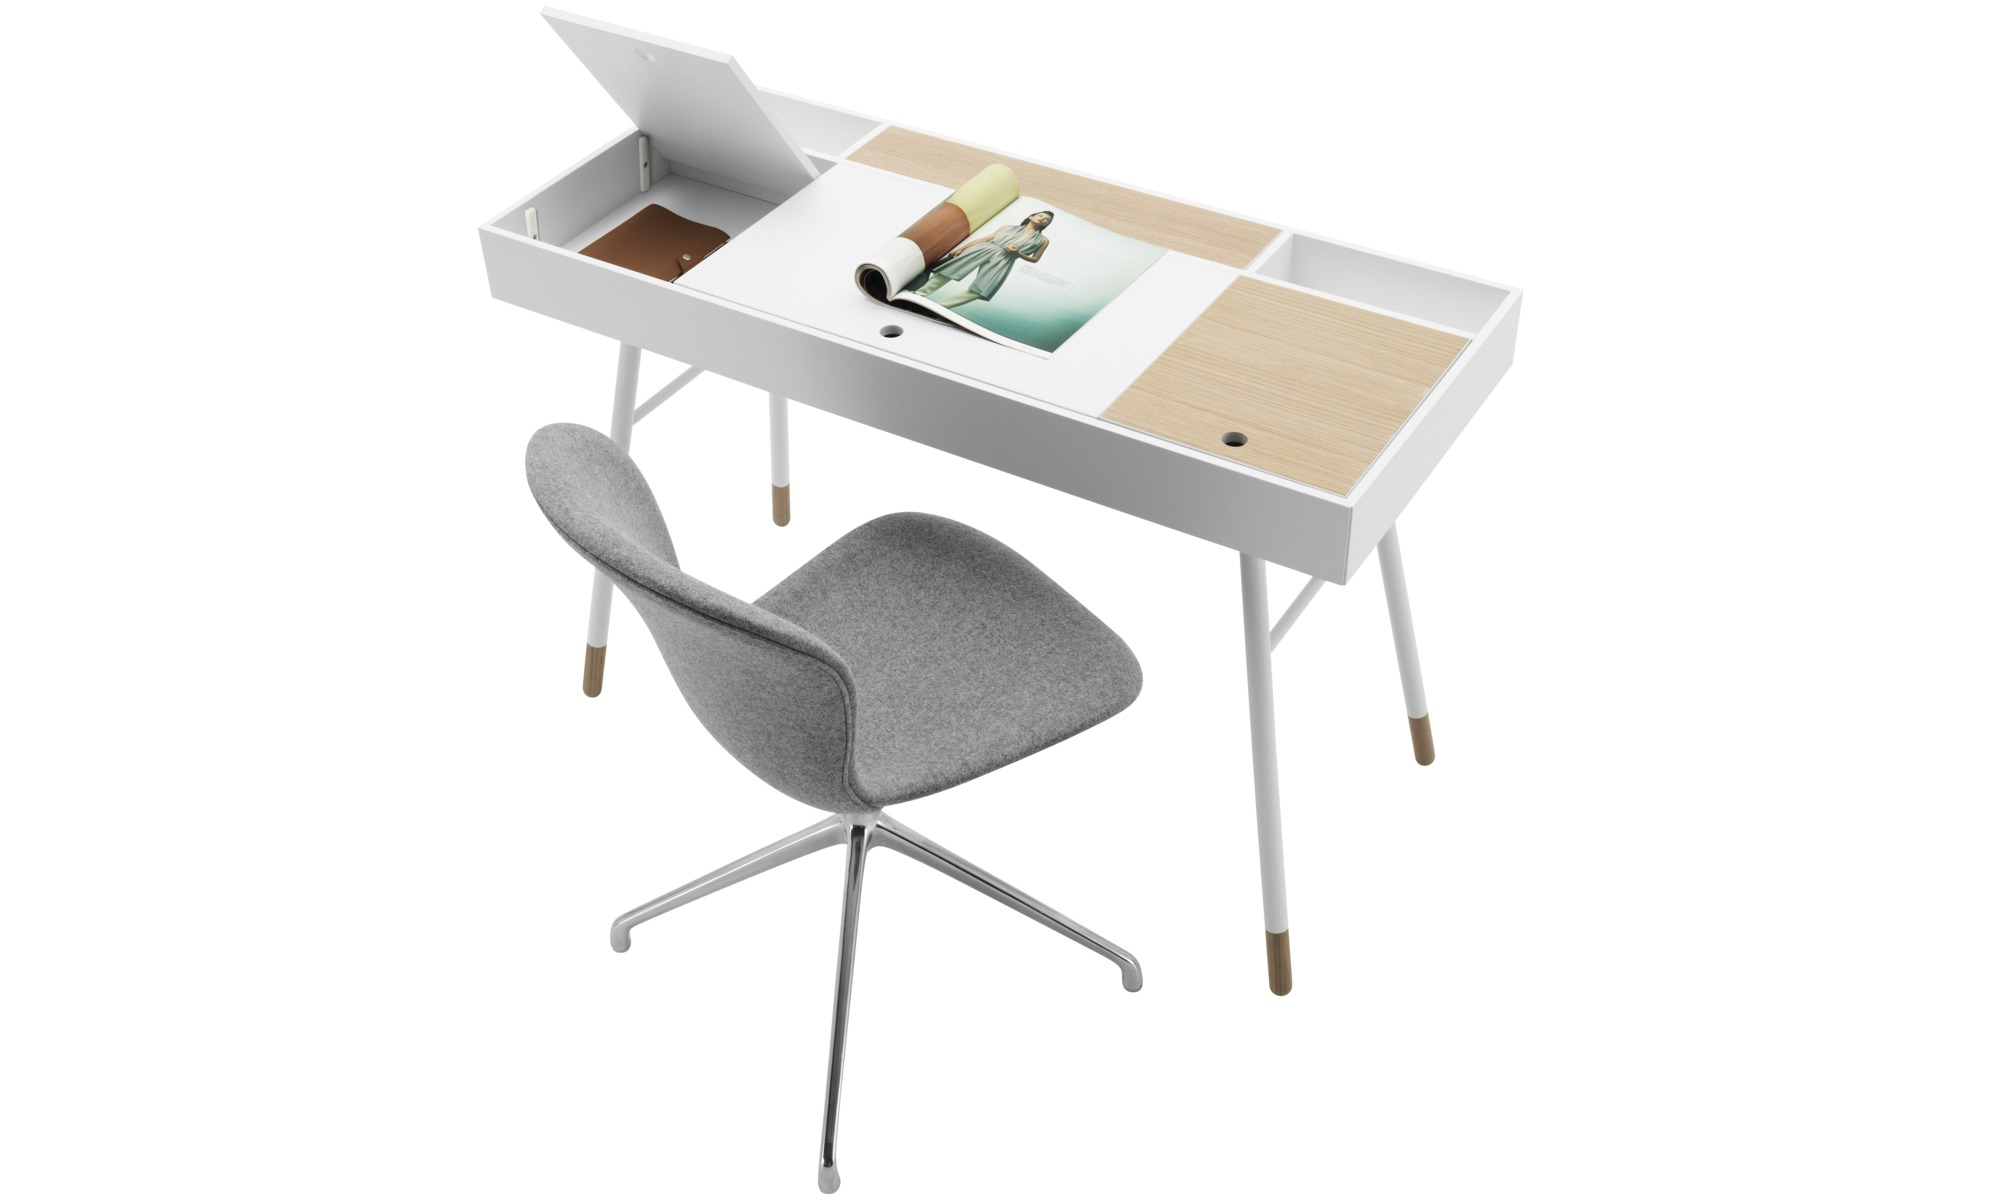 bureau boconcept bureau boconcept wish list deco pinterest boconcept cupertino desk. Black Bedroom Furniture Sets. Home Design Ideas